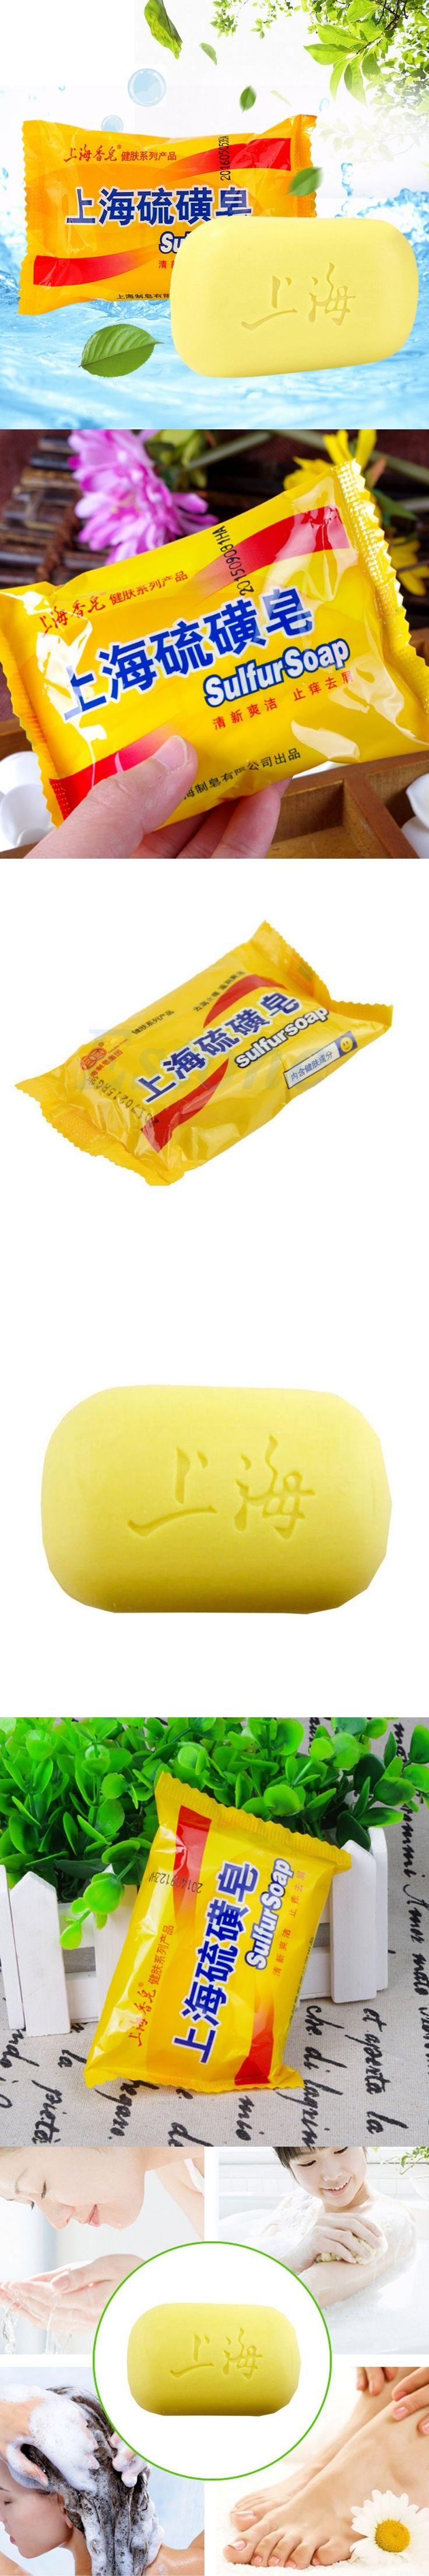 85g China Sulfur Soap 4 Skin Conditions Acne Anti Fungus Perfume Butter Bubble Bath Healthy Soaps